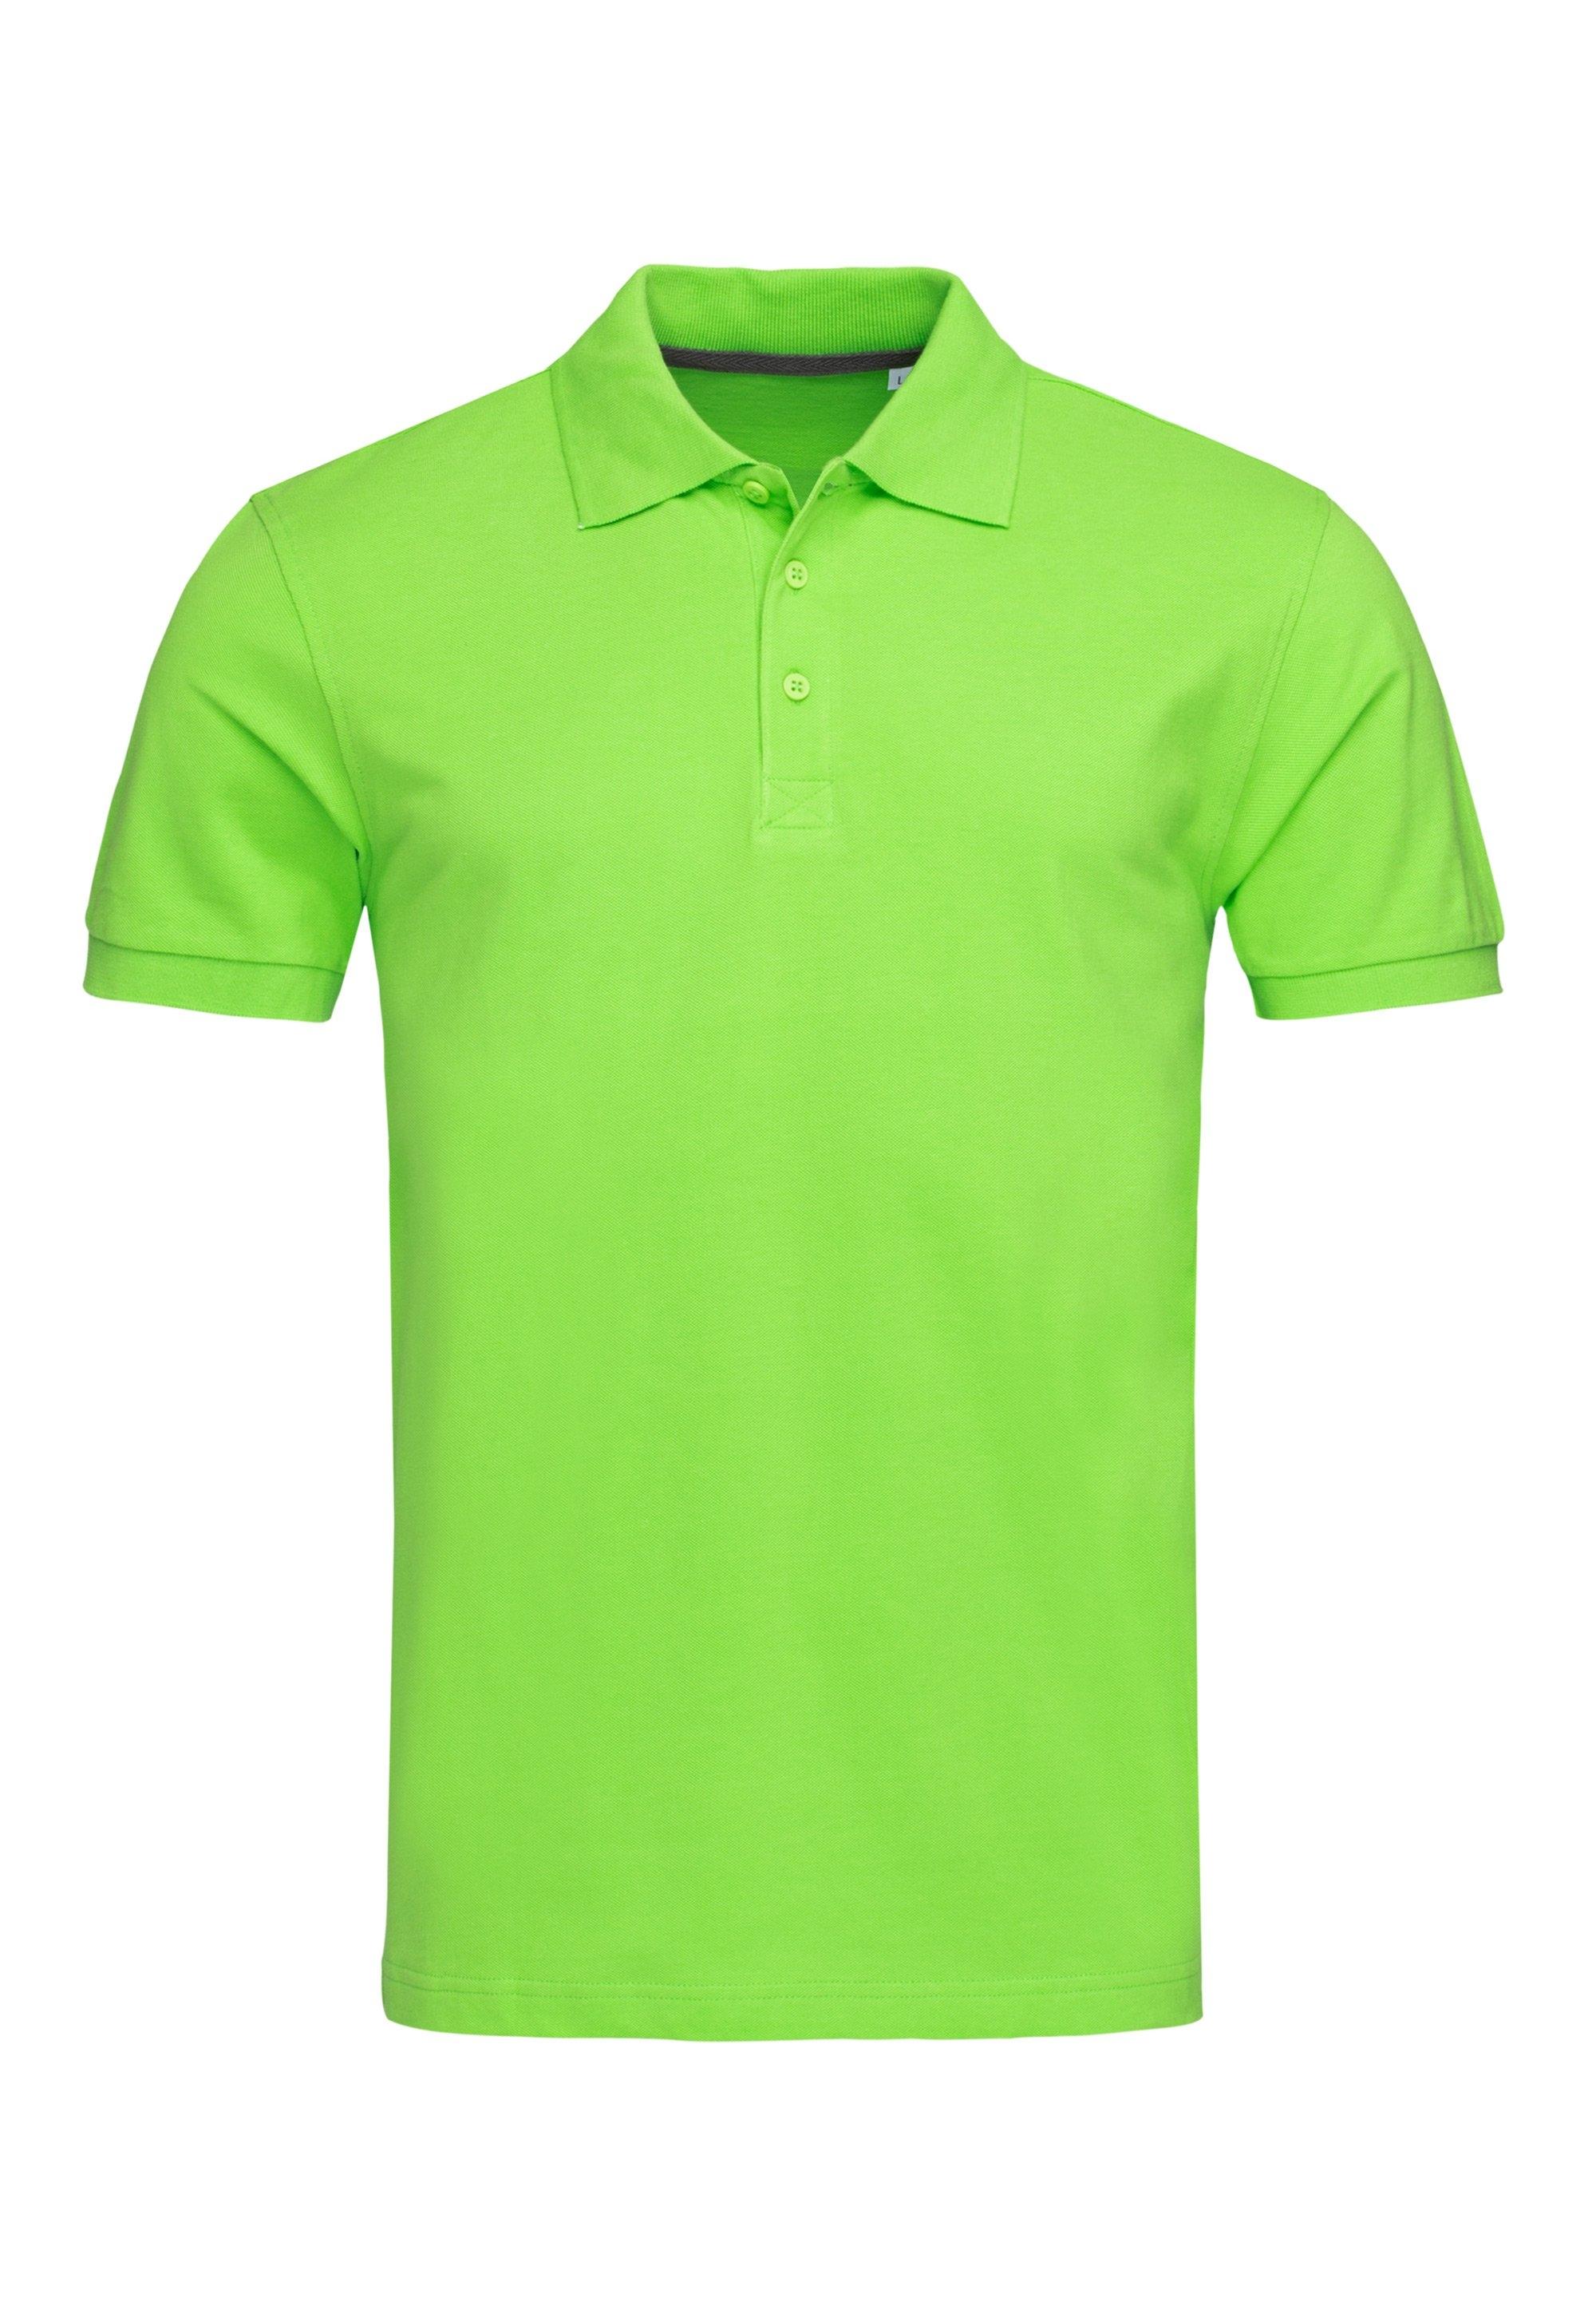 Stedman Poloshirt voordelig en veilig online kopen